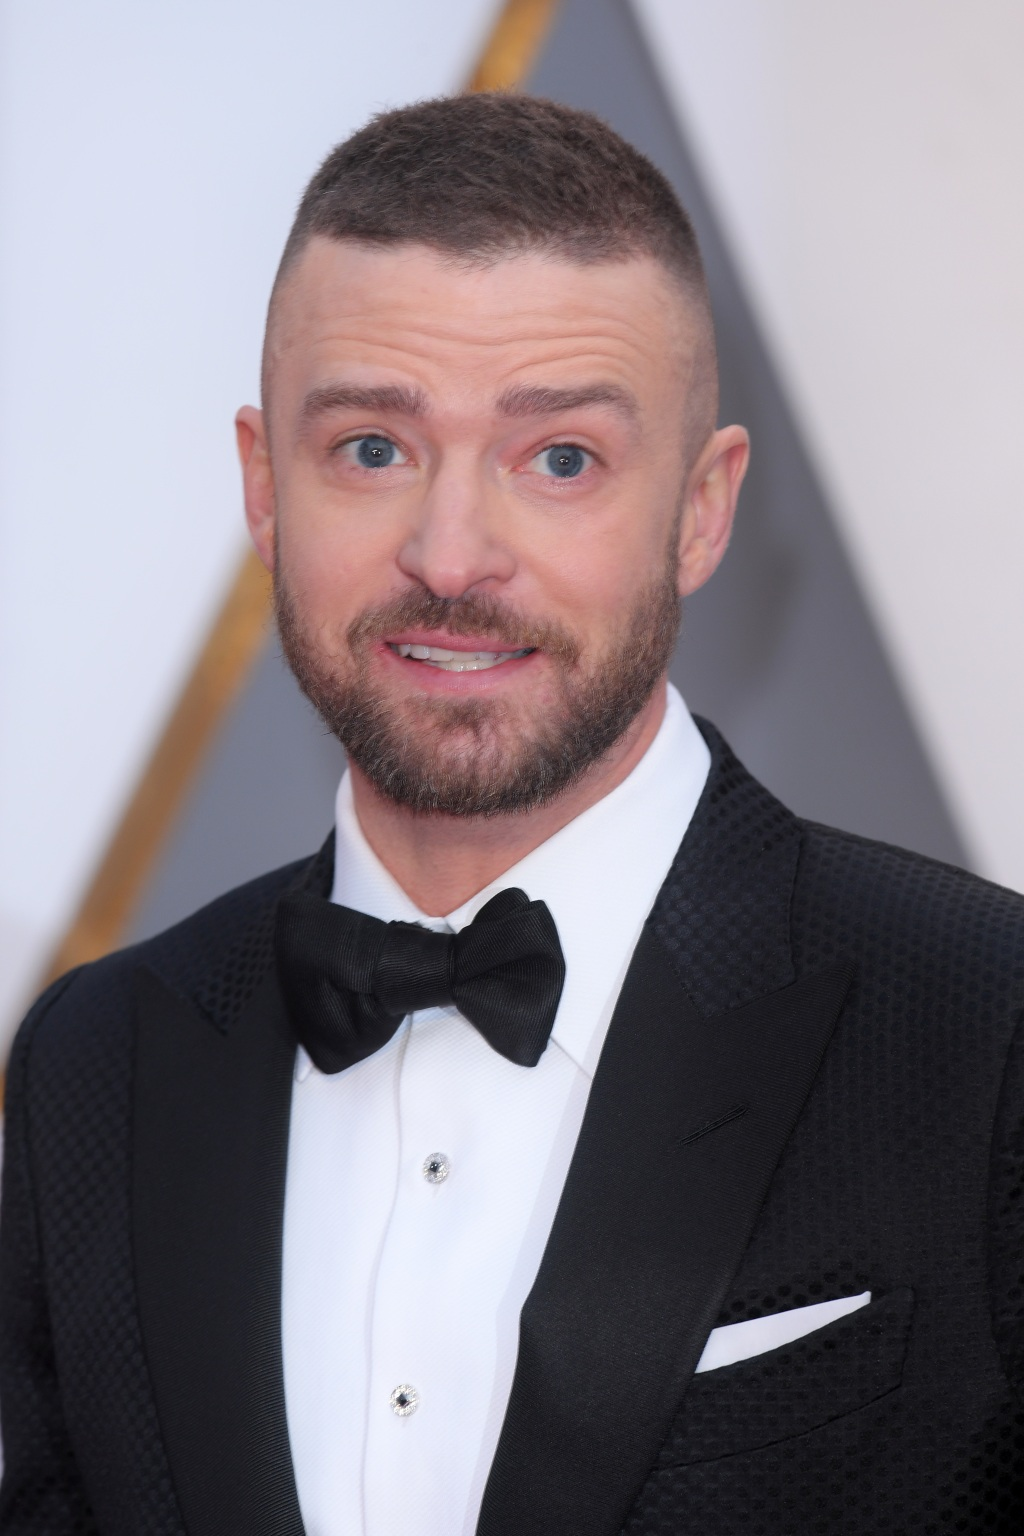 Justin Timberlake 2017 Oscars